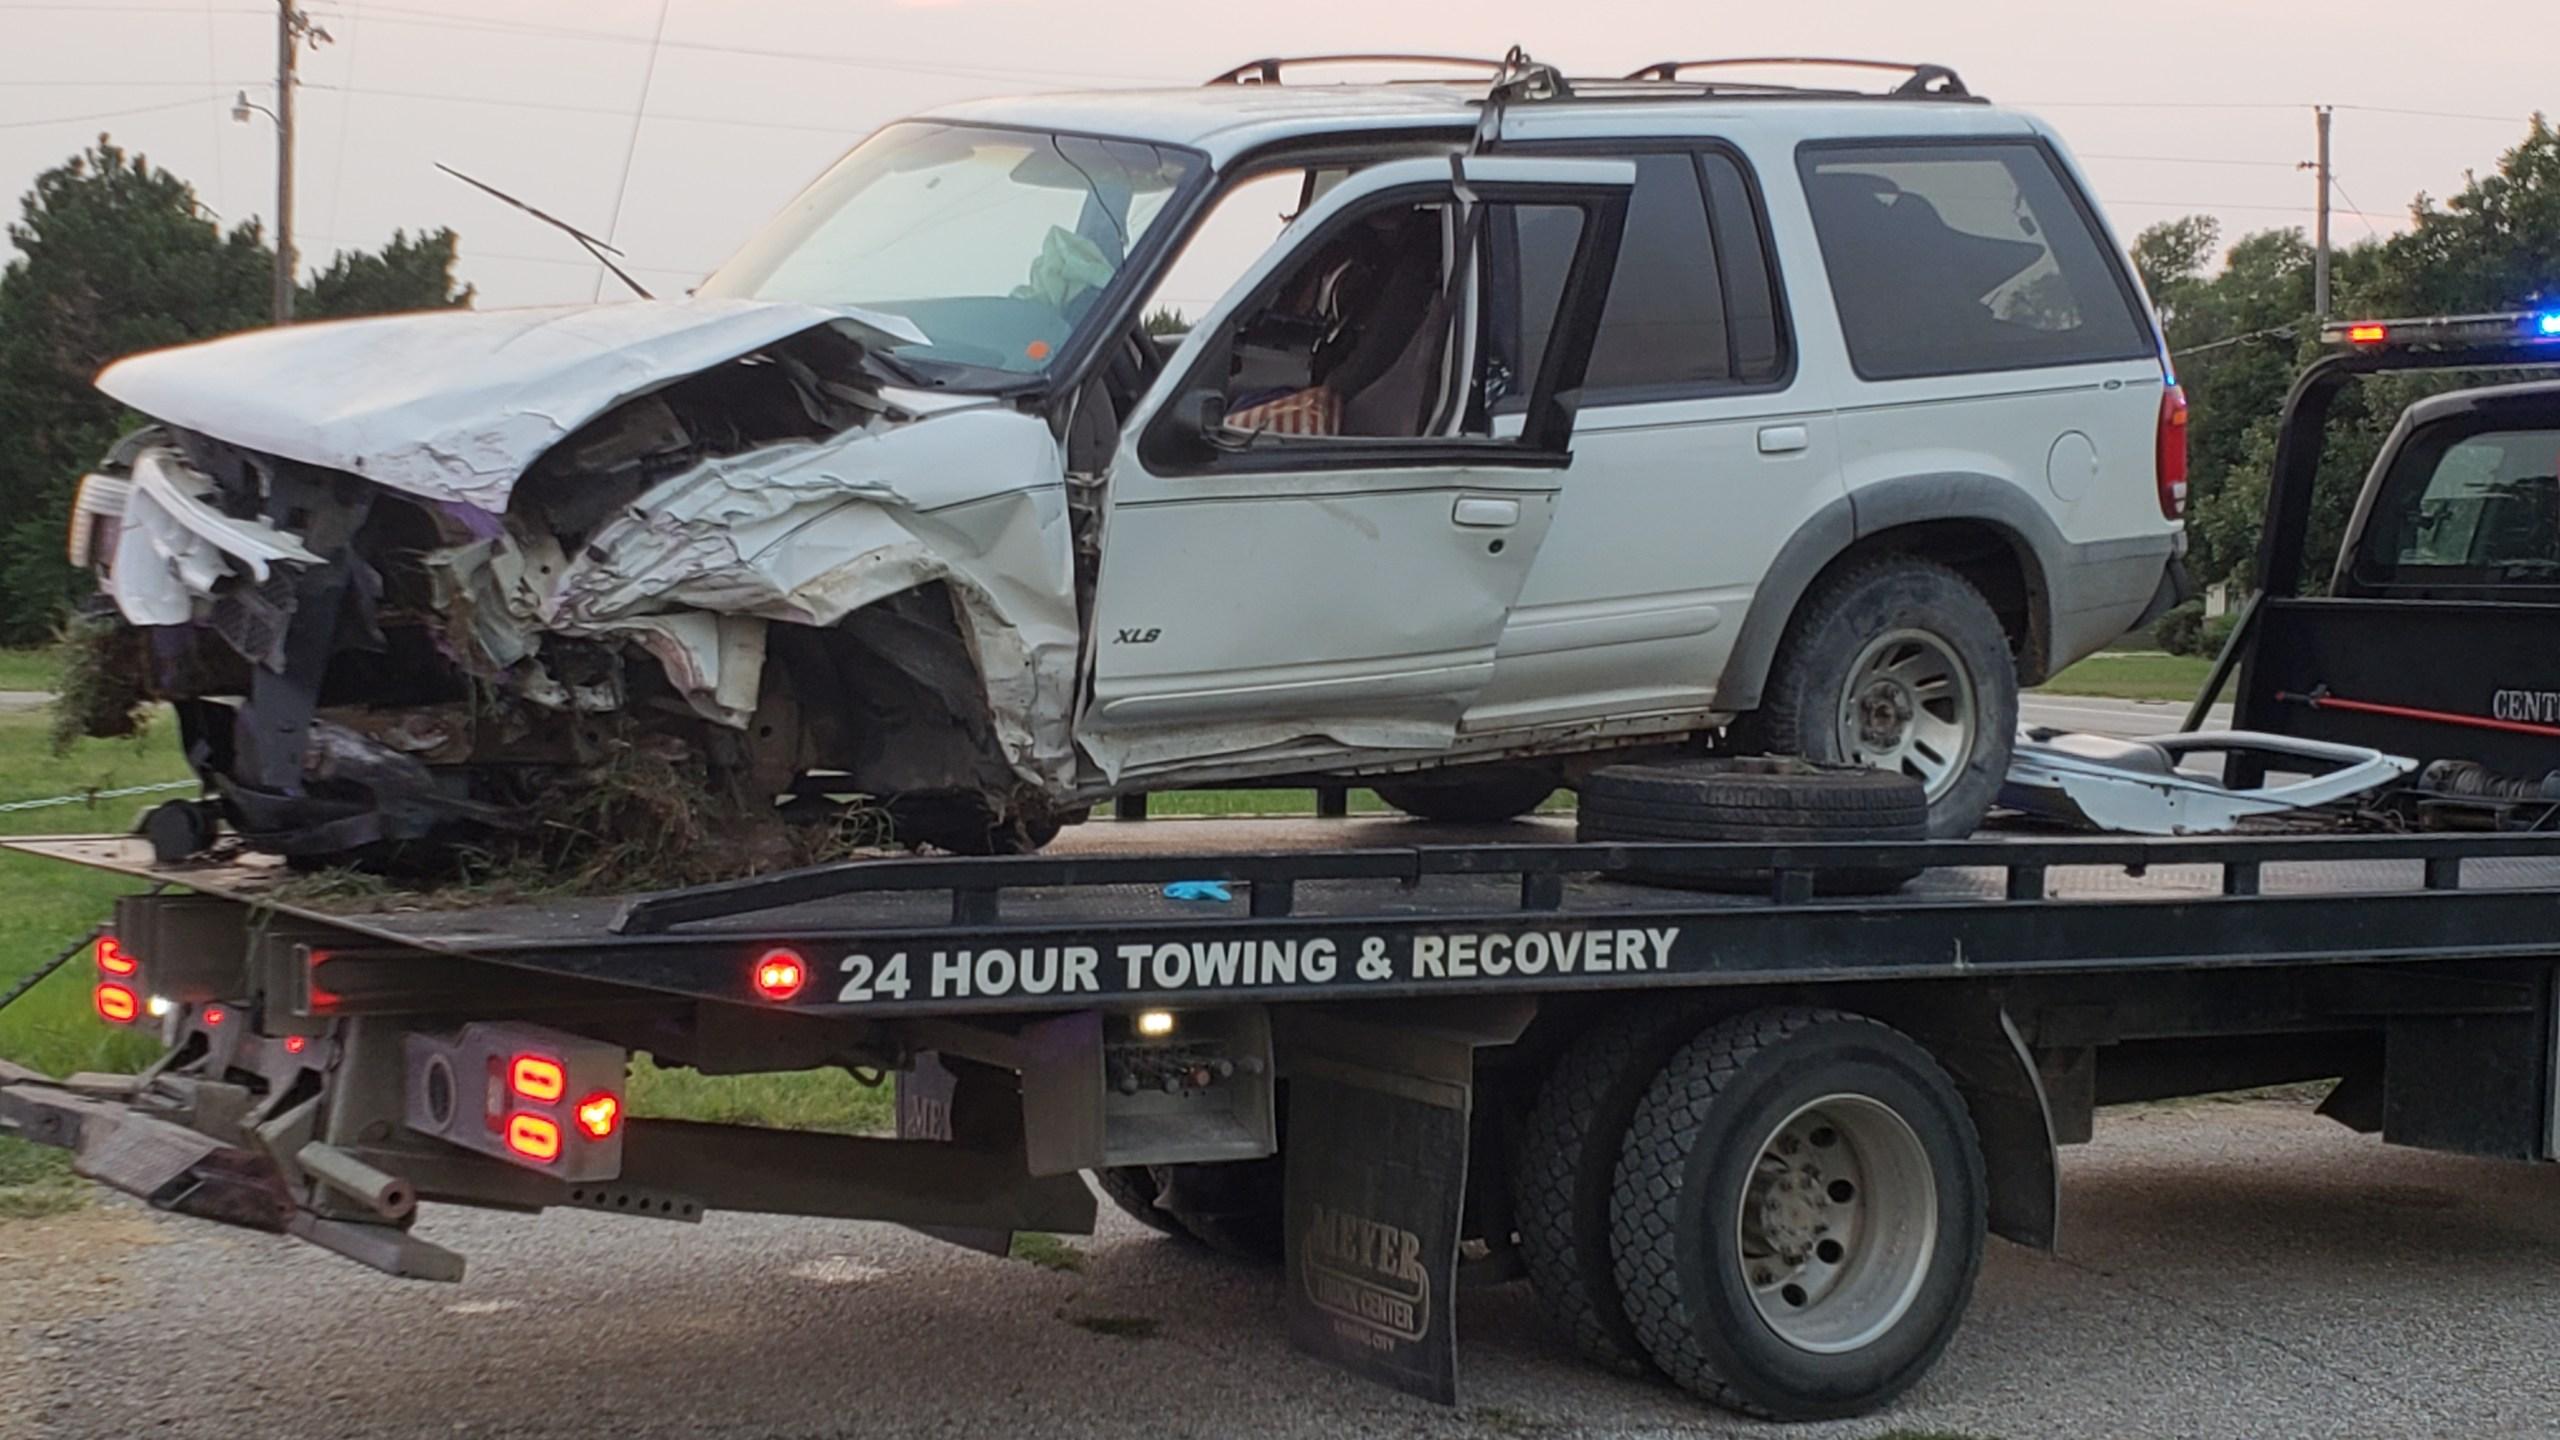 2 injured, 1 critically, in Butler County crash